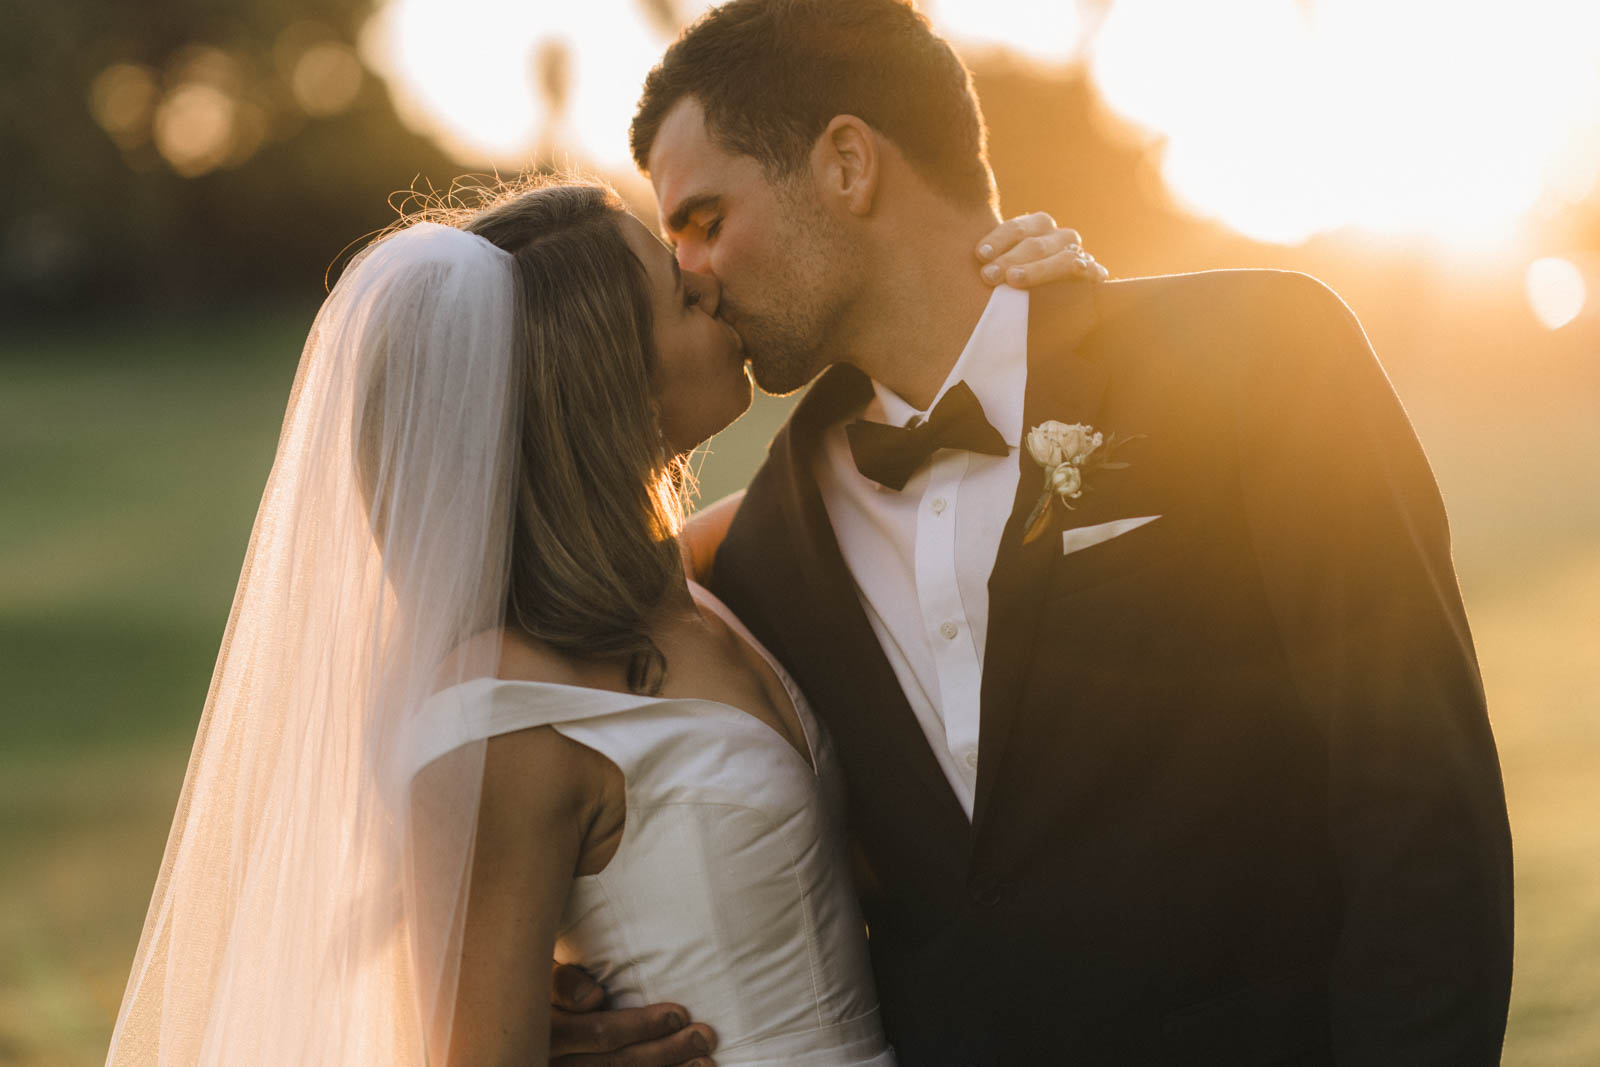 newfound-s-p-mt-maunganui-tauranga-wedding-photographer-1807-A9_07794